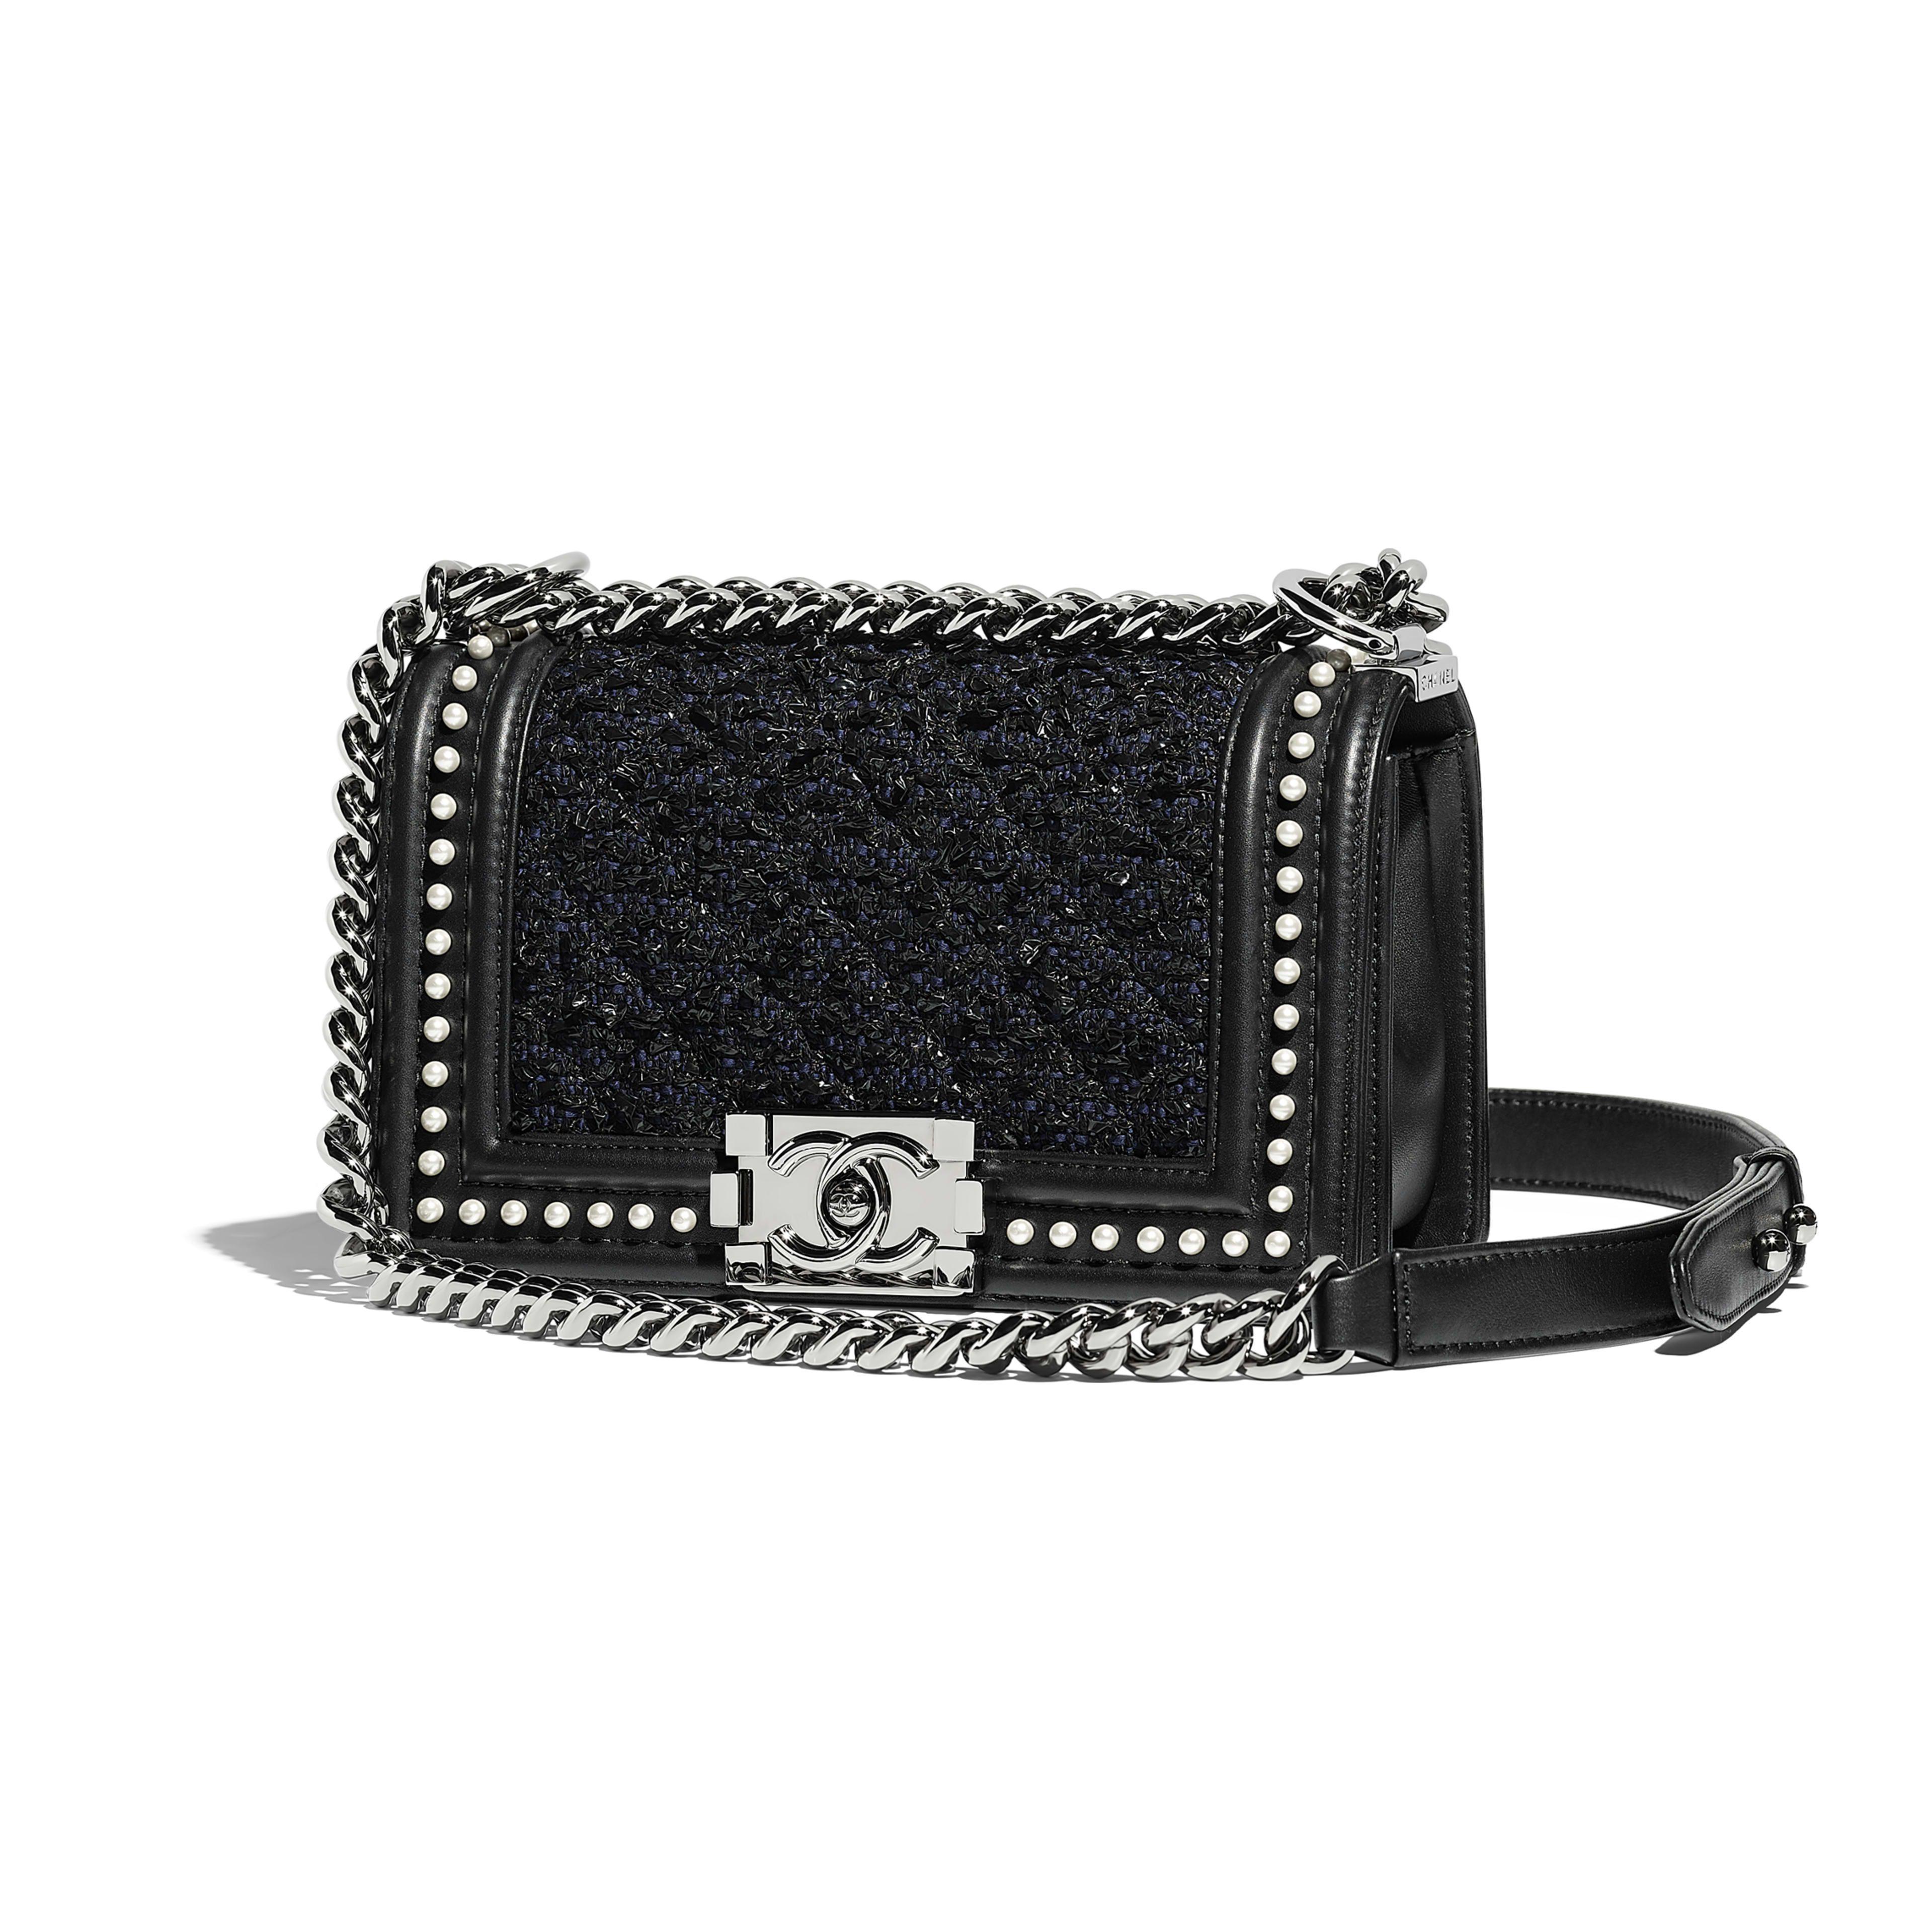 d8e1be80ceb75 Small BOY CHANEL Handbag Tweed, Calfskin, Imitation Pearls & Ruthenium-Finish  Metal Black & Navy Blue - view 1 - see full sized version